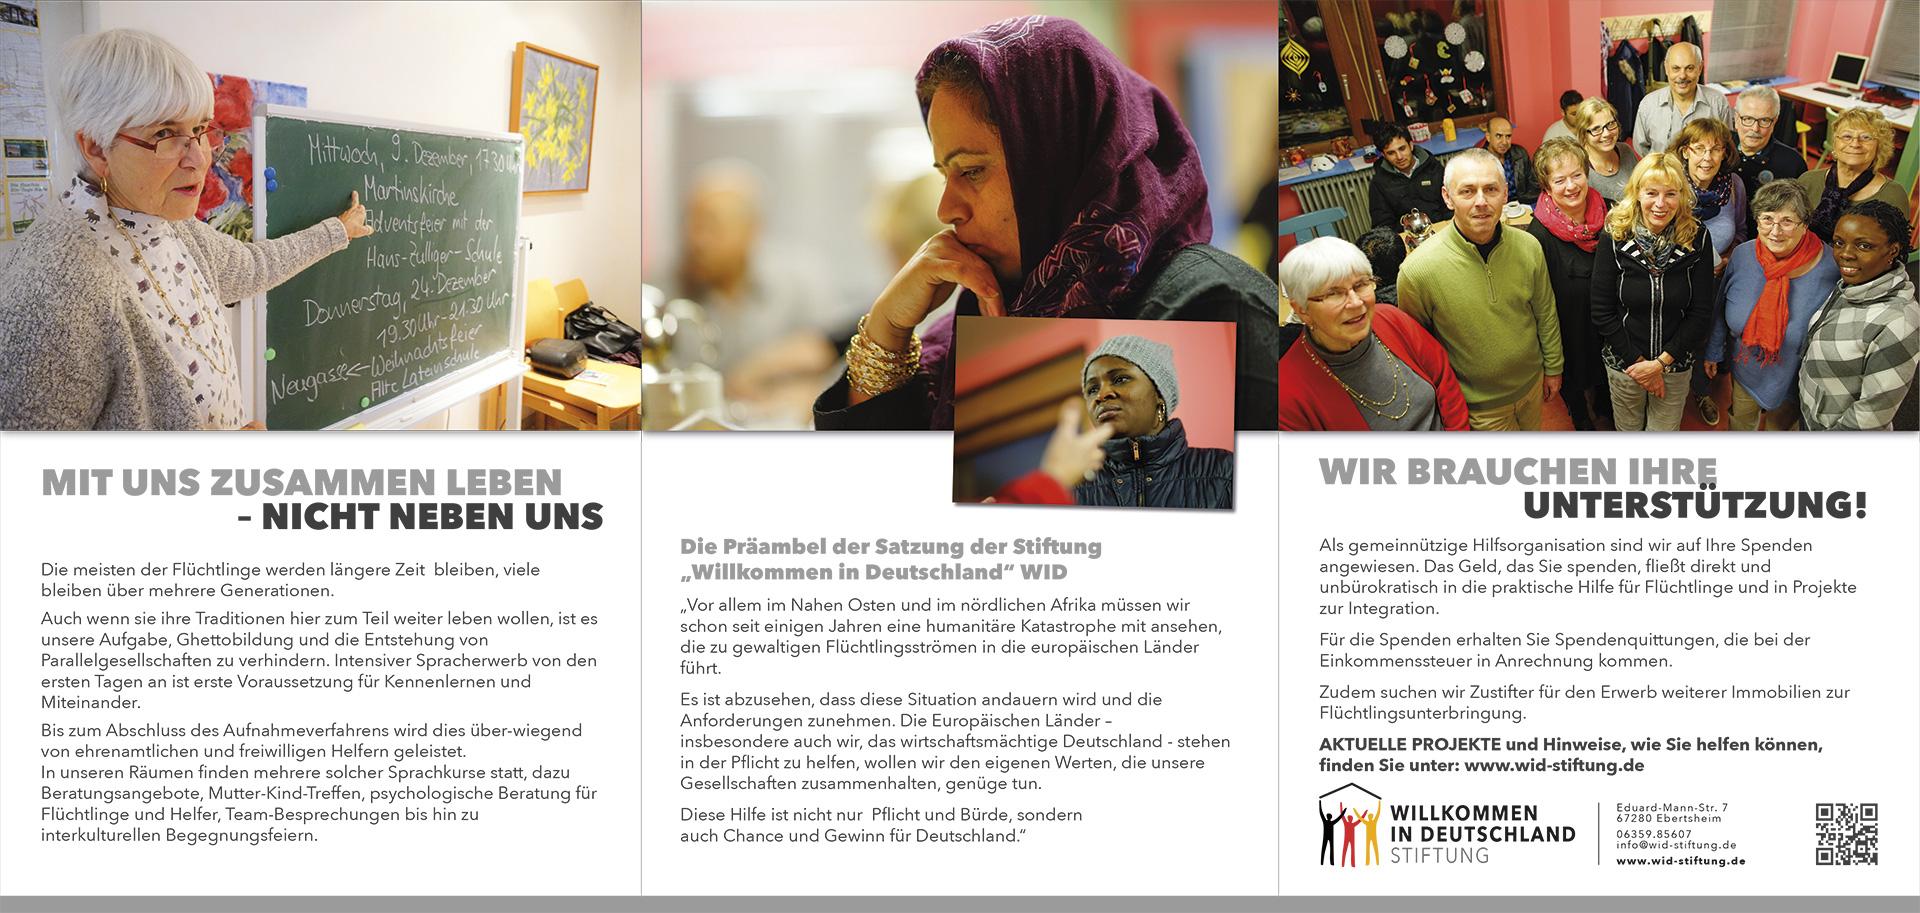 WID Stiftung